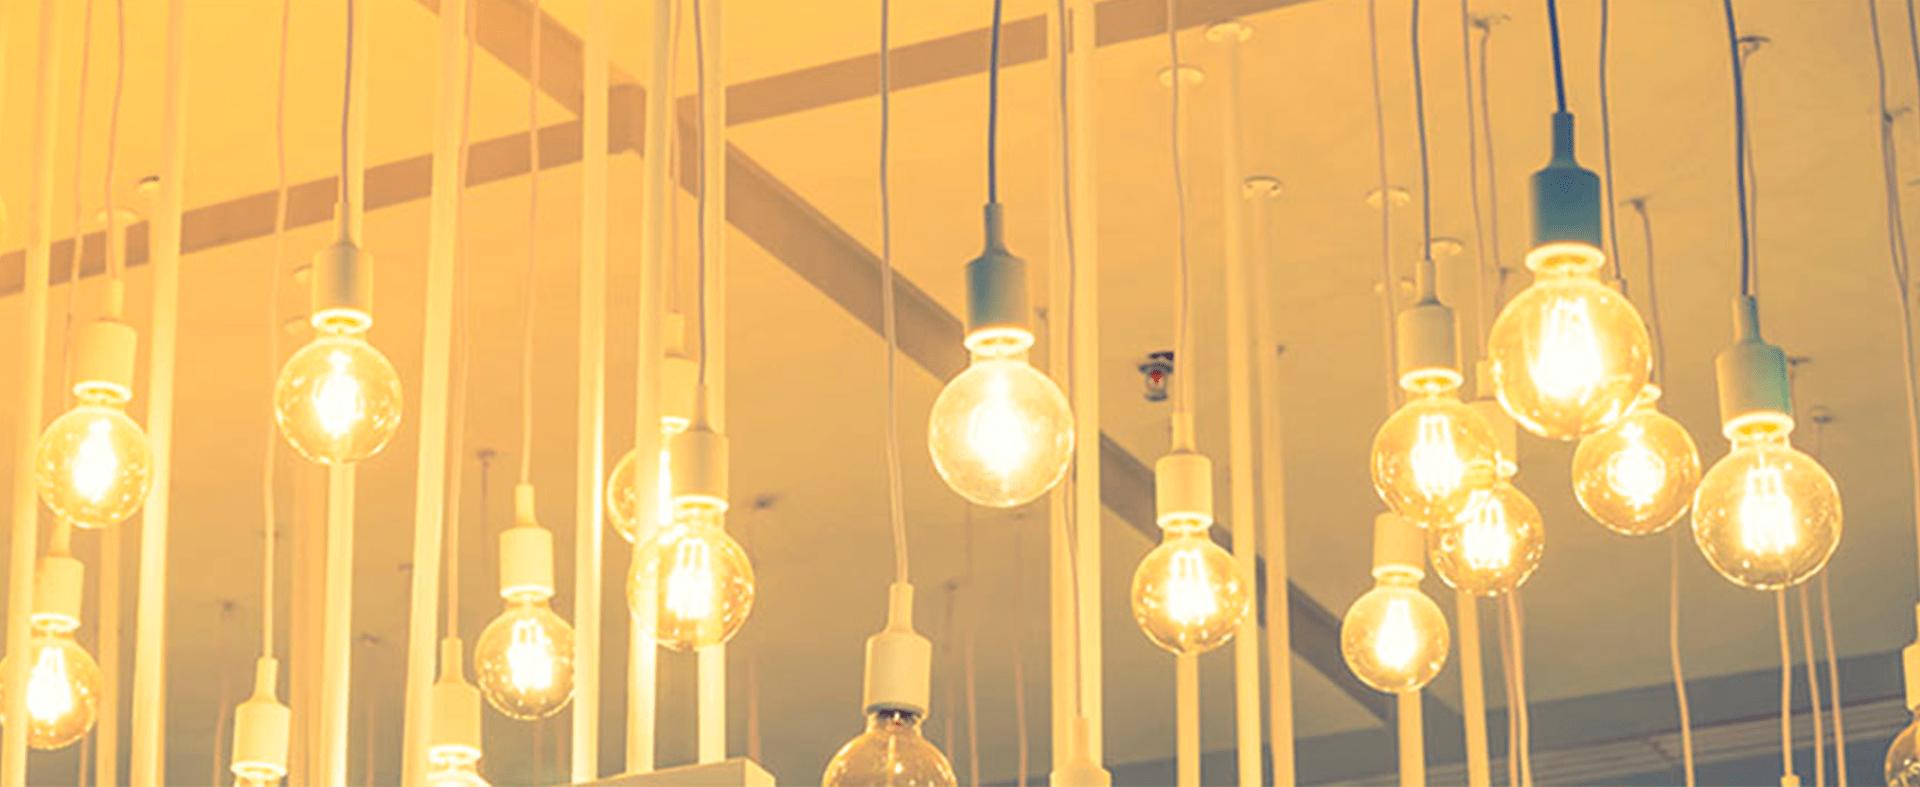 IMS 2020 Soluciones de Energia S.L , nuevo cliente Marketing Outsourcing de Lifting Group Valencia